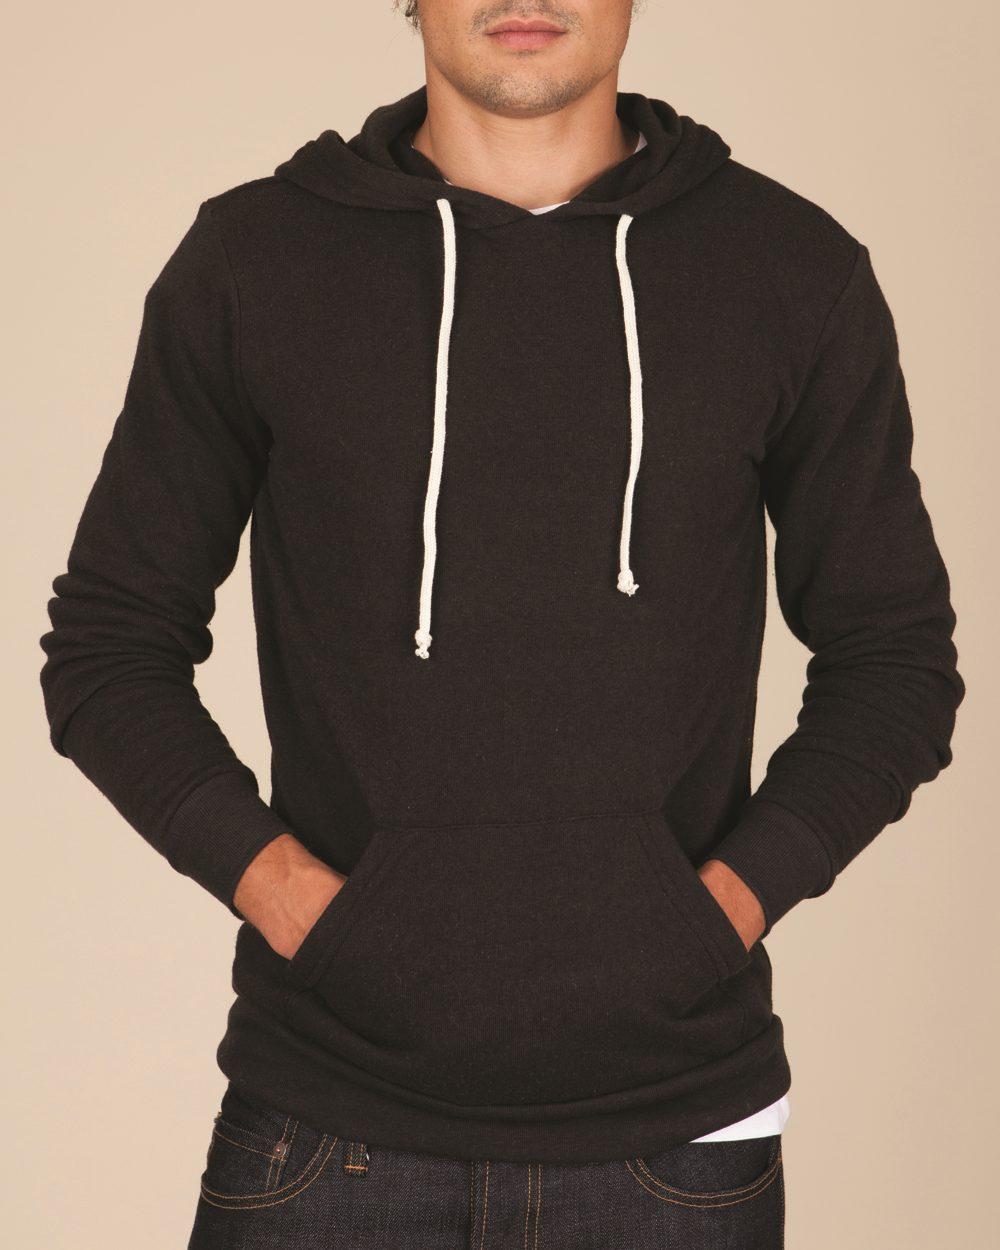 Alternative Eco-Fleece Hoodlum Hooded Pullover - 9595